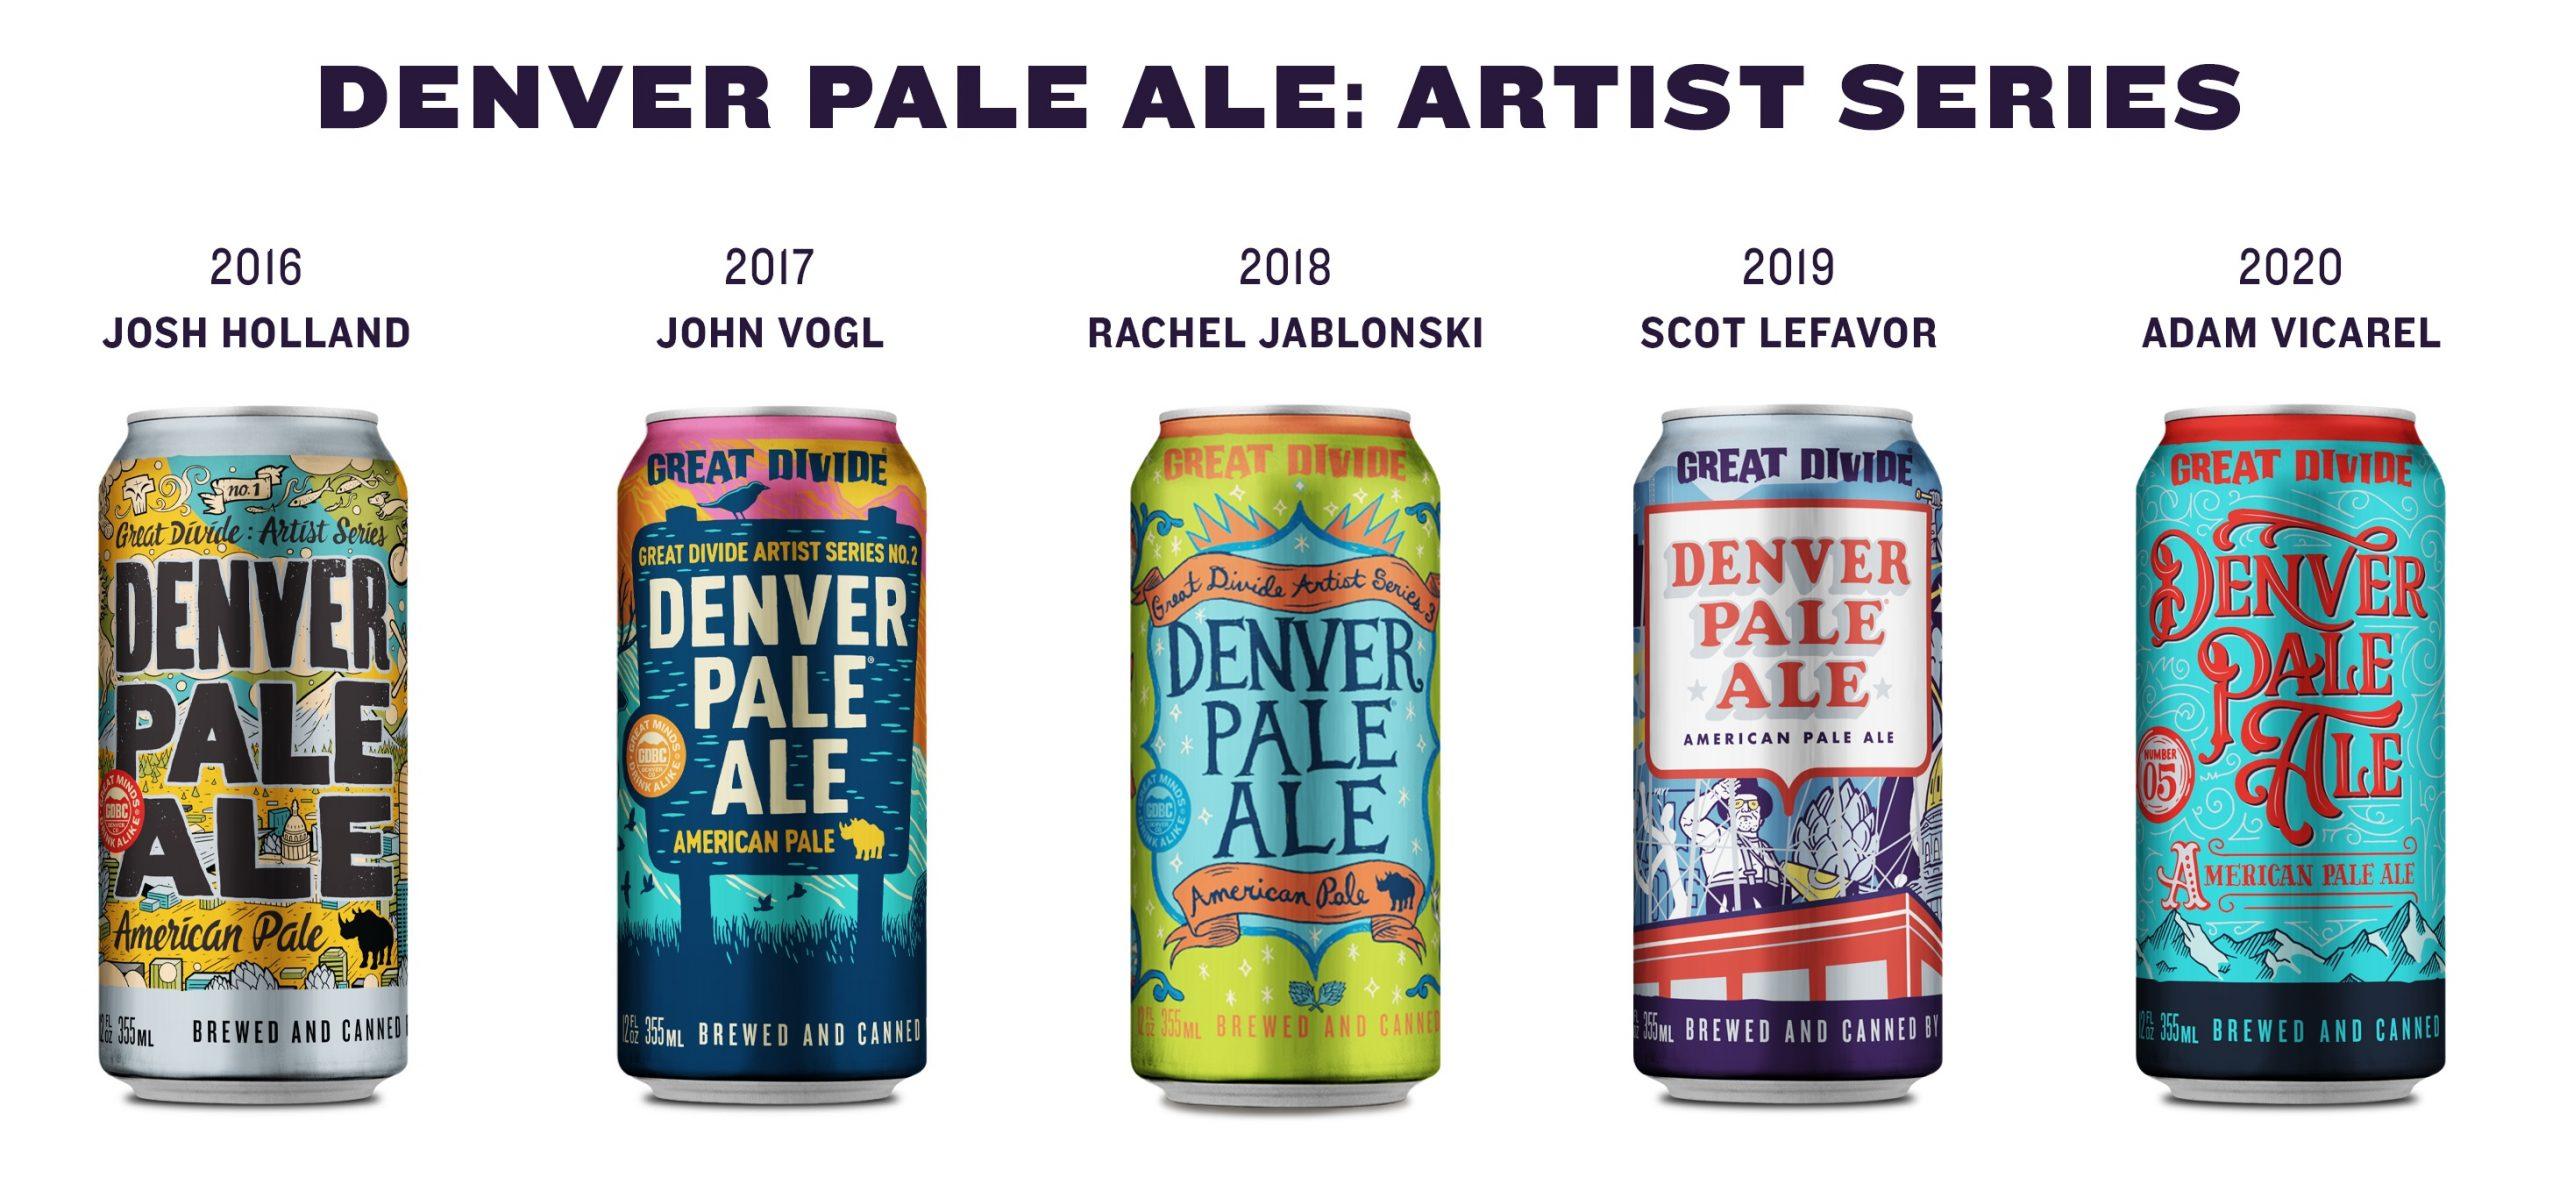 Denver Pale Ale: Artist Series Adam Vicarel